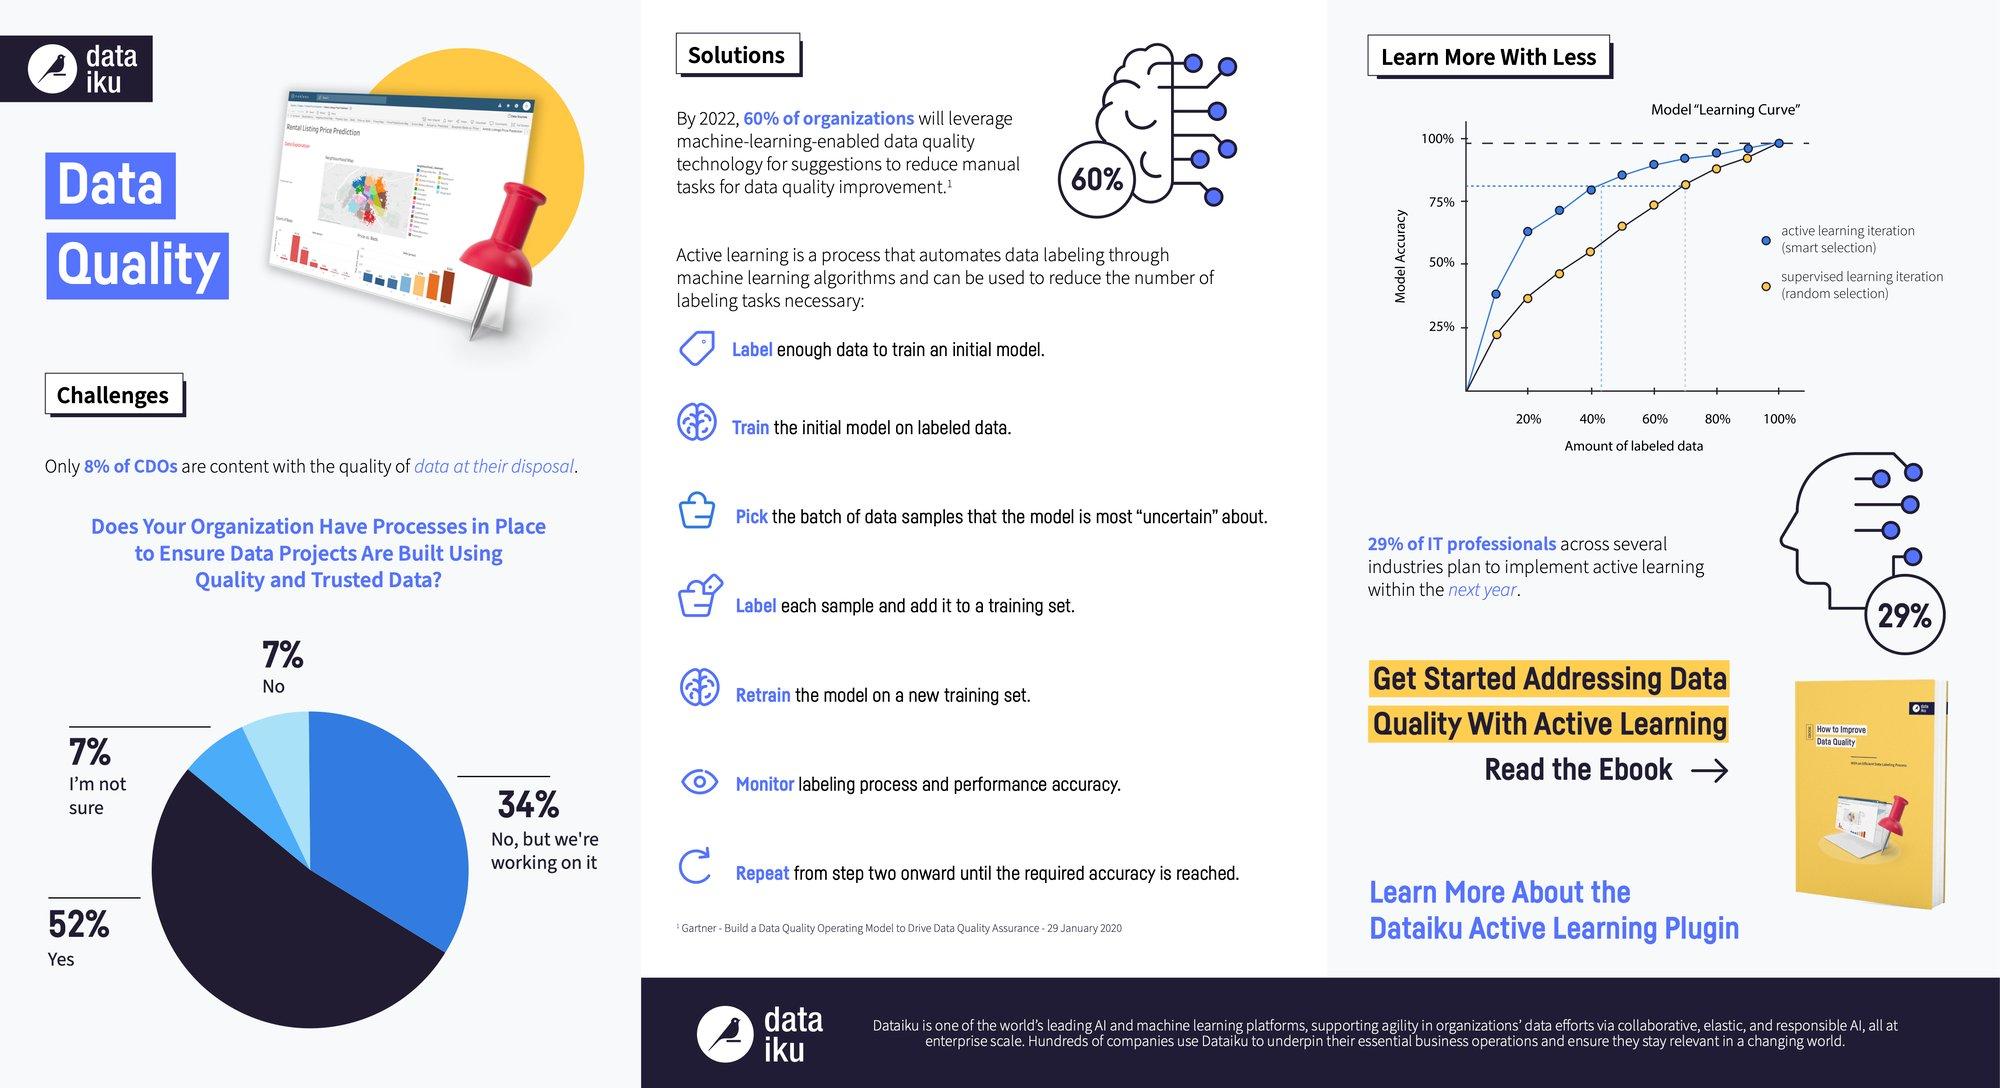 GM1803-DAC Updating Data Quality Infographic_v03